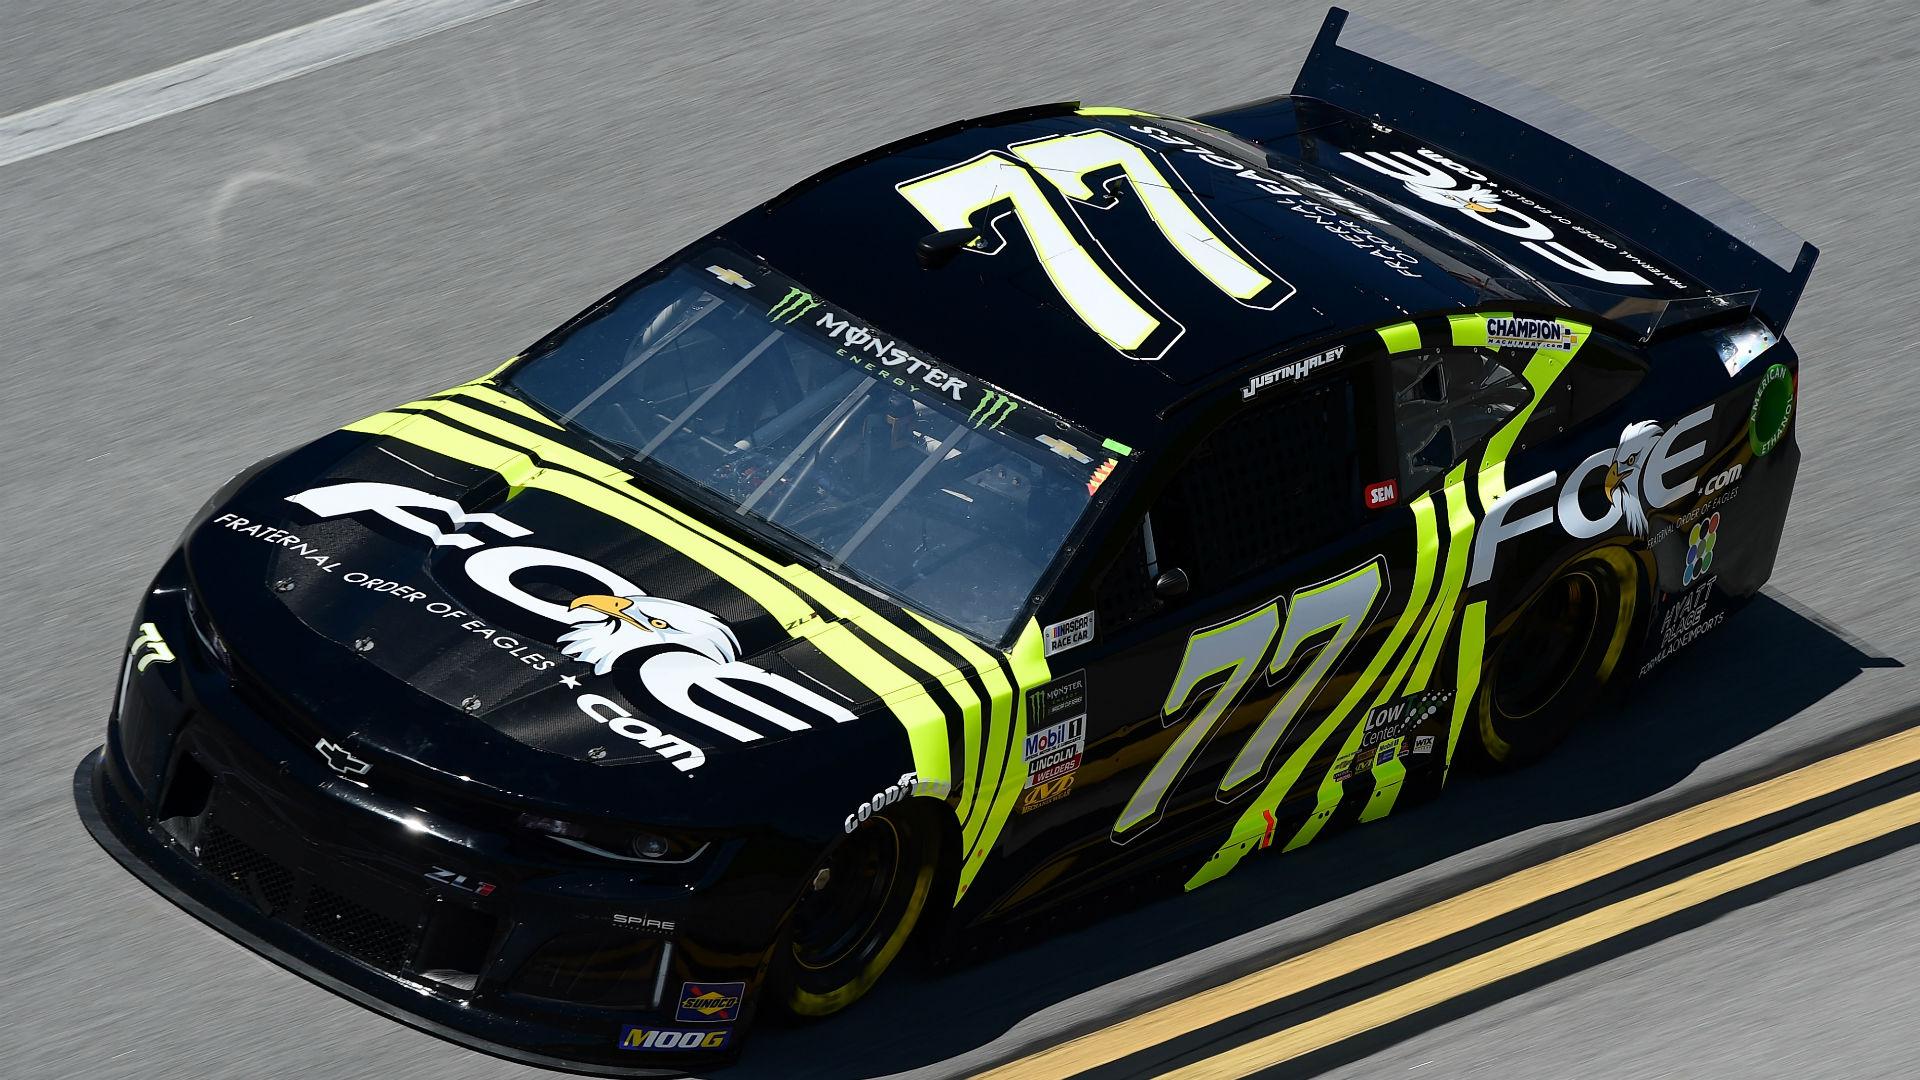 NASCAR results at Daytona: Justin Haley wins Coke Zero Sugar 400 in third career Cup Series start